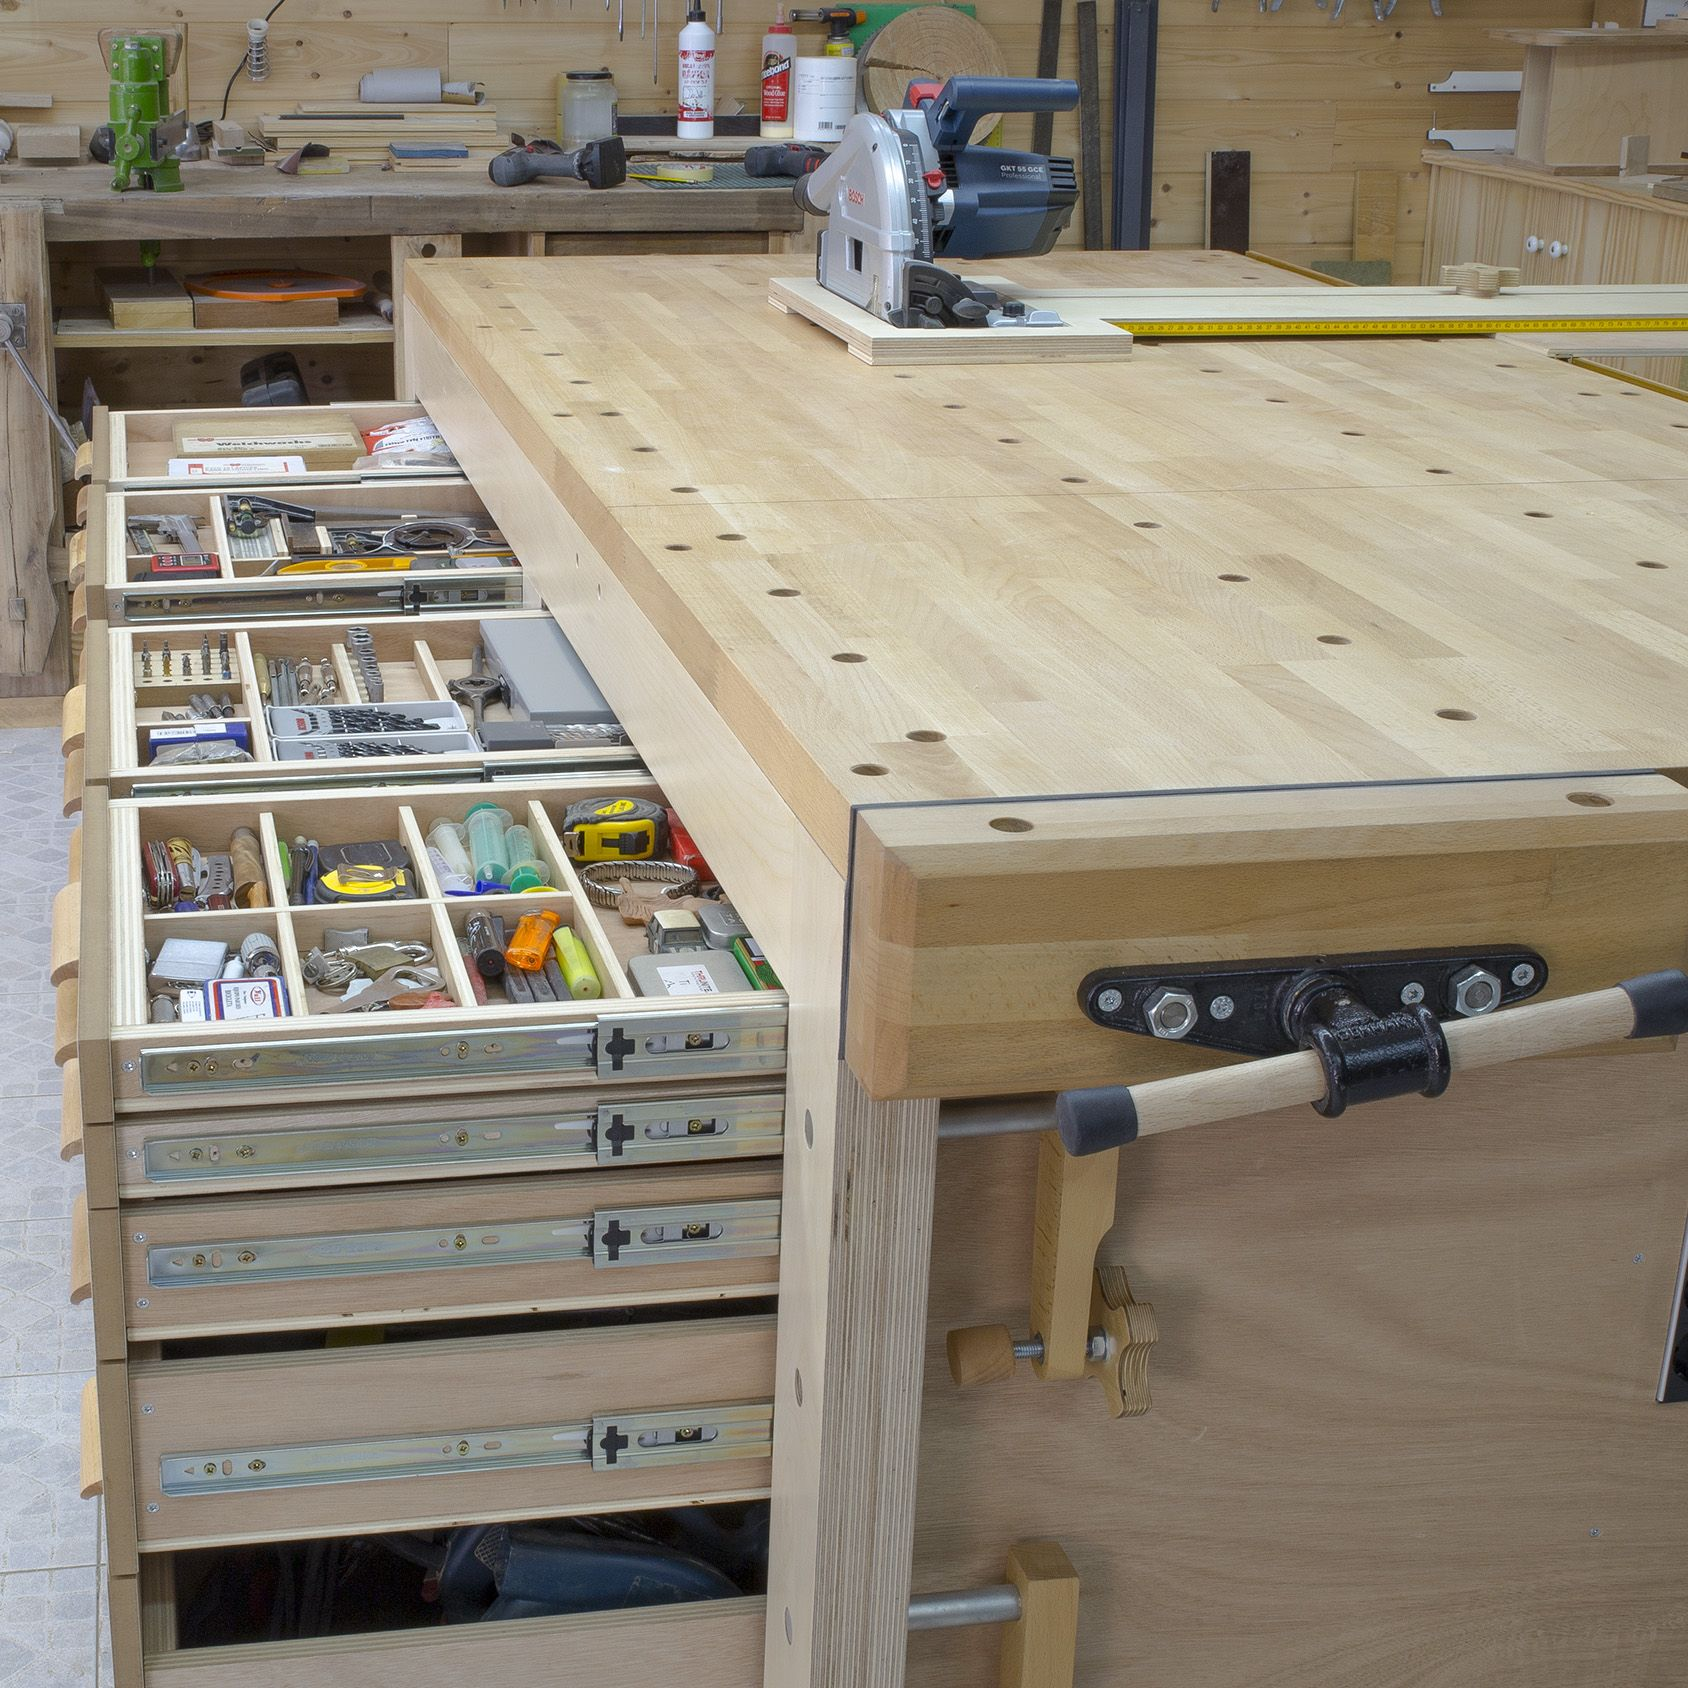 High Capacity Multi Function Workbench Build Woodworking Workbench Workbench Woodworking Bench Plans